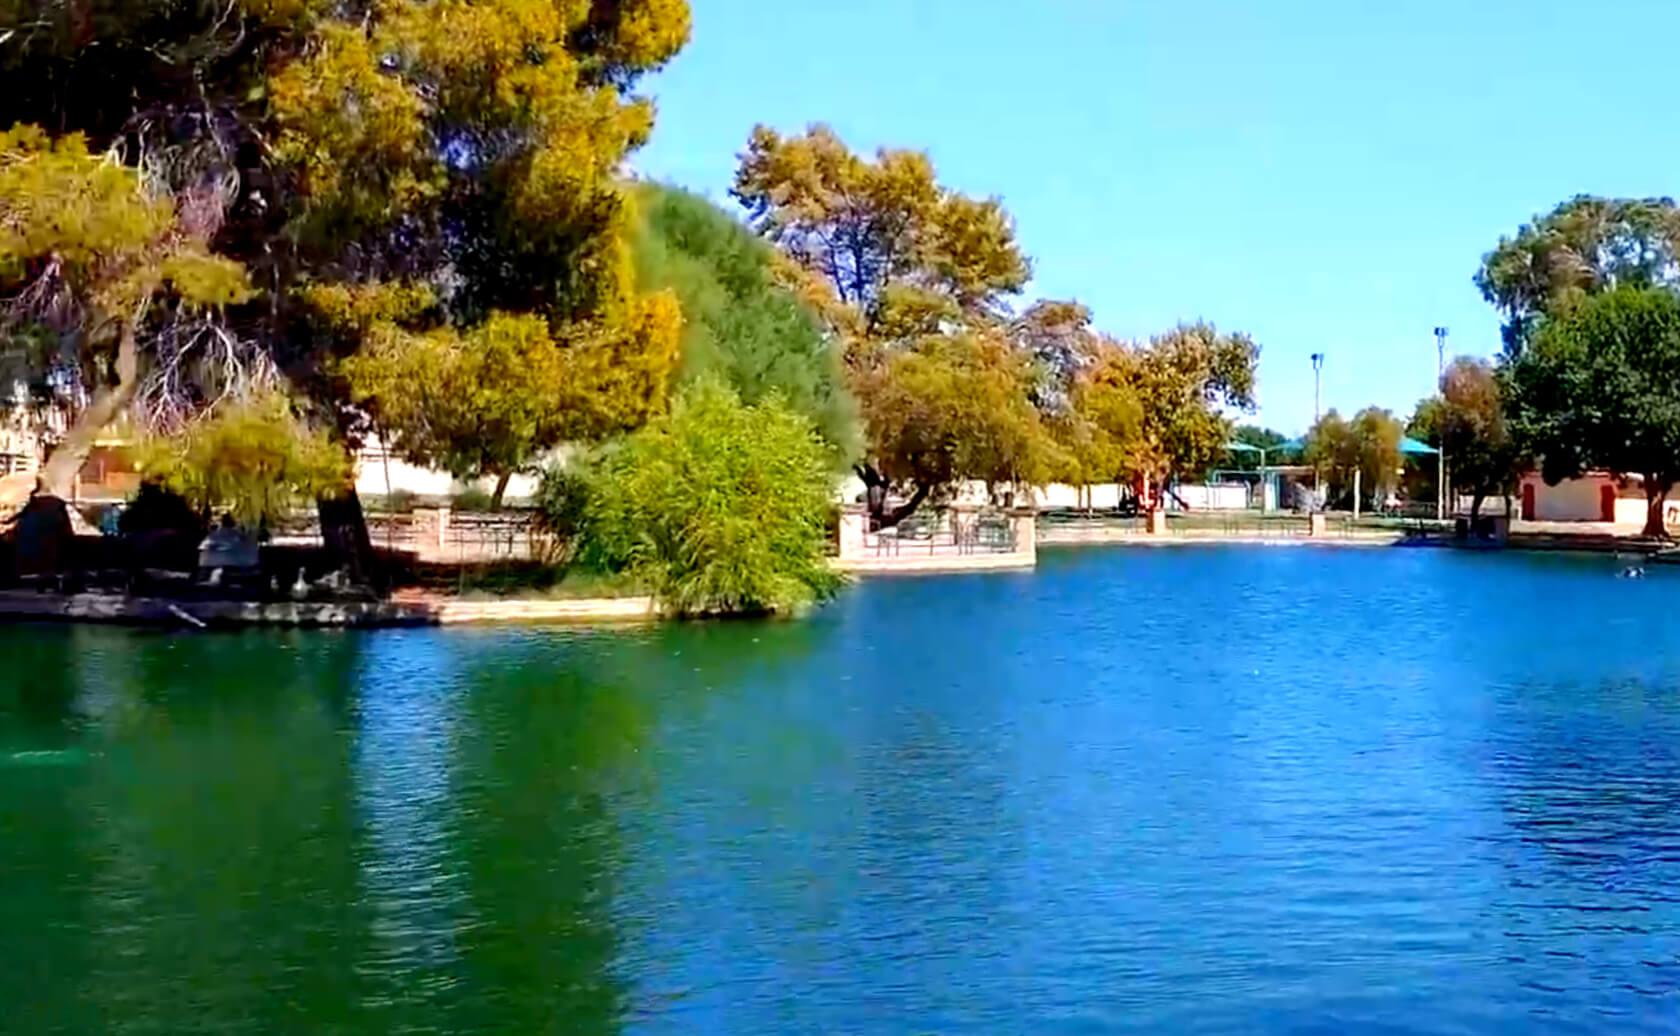 Bonsall-Pond-Lake-Fishing-Guide-Report-Glendale-AZ-04